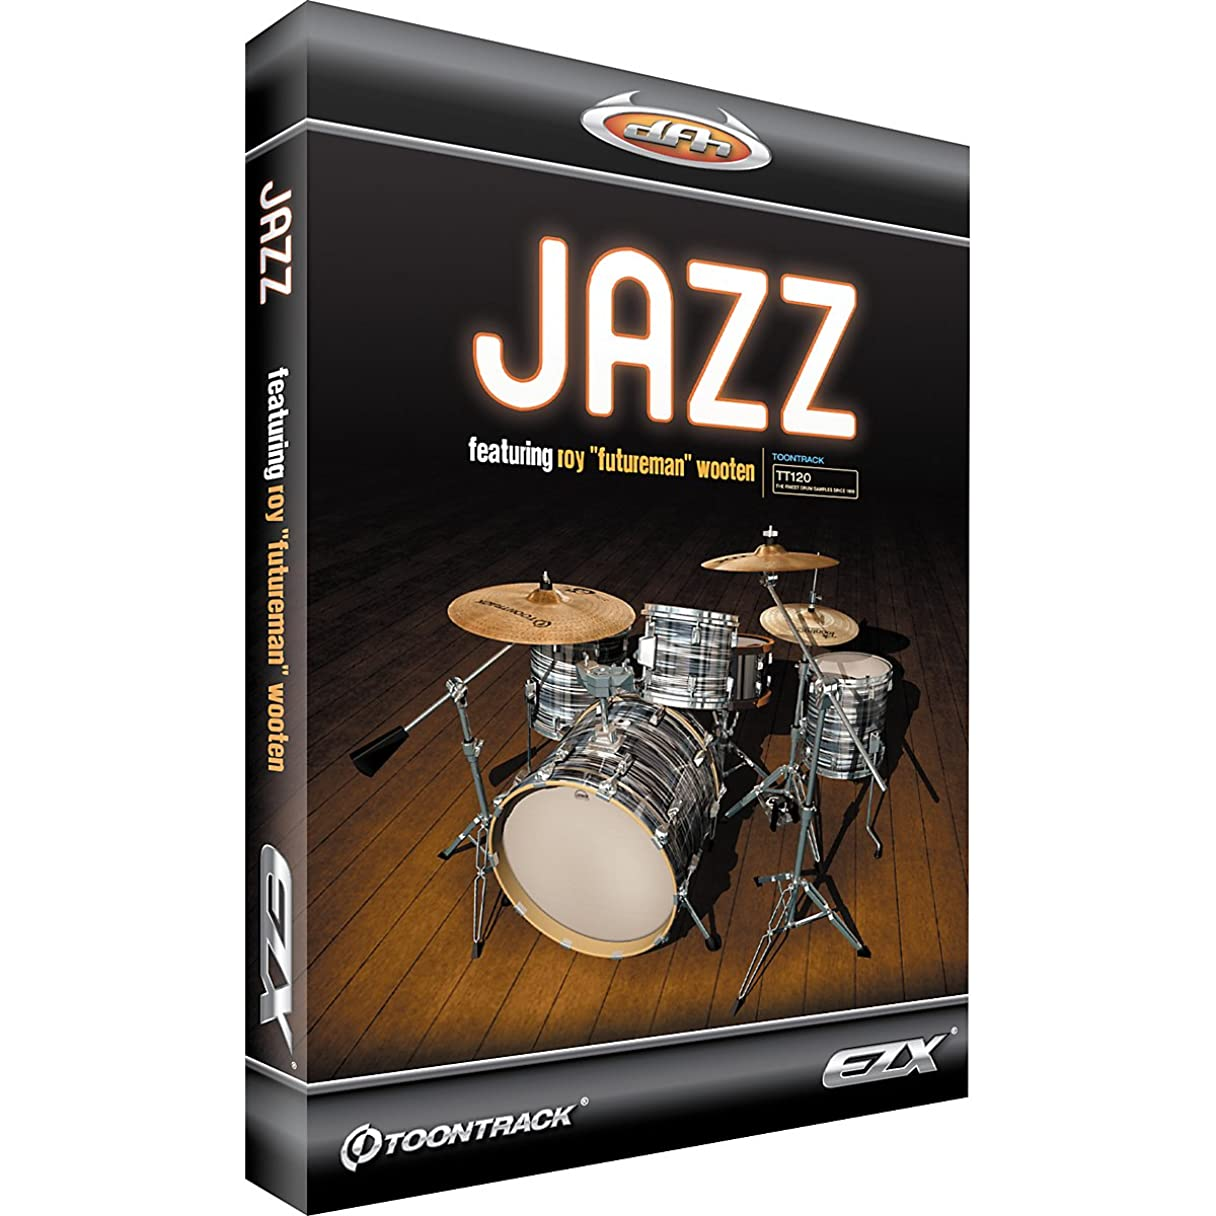 ディプロマ自動化音TOONTRACK - JAZZEZX - extension jazz ezx